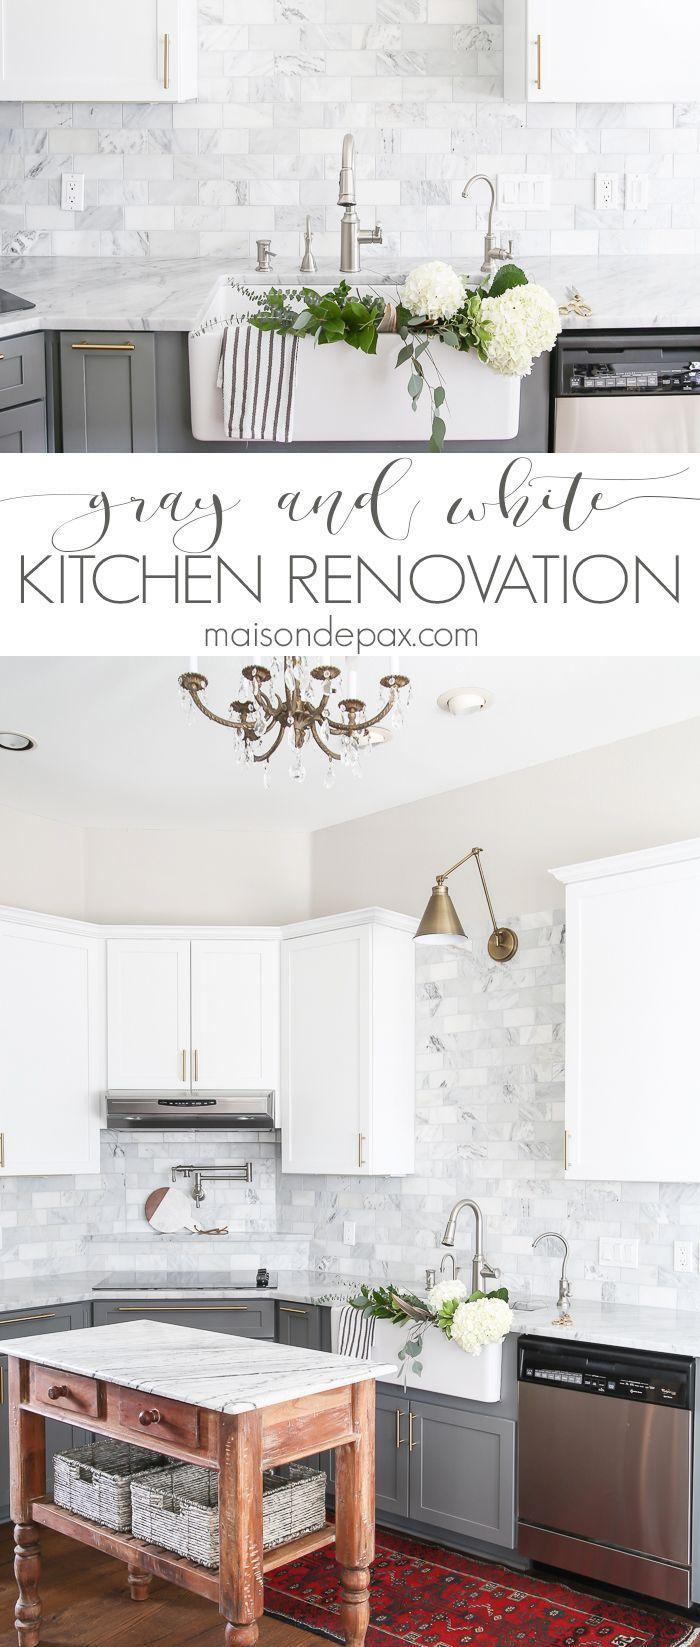 184 best Kitchen Design images on Pinterest | Dream kitchens ...